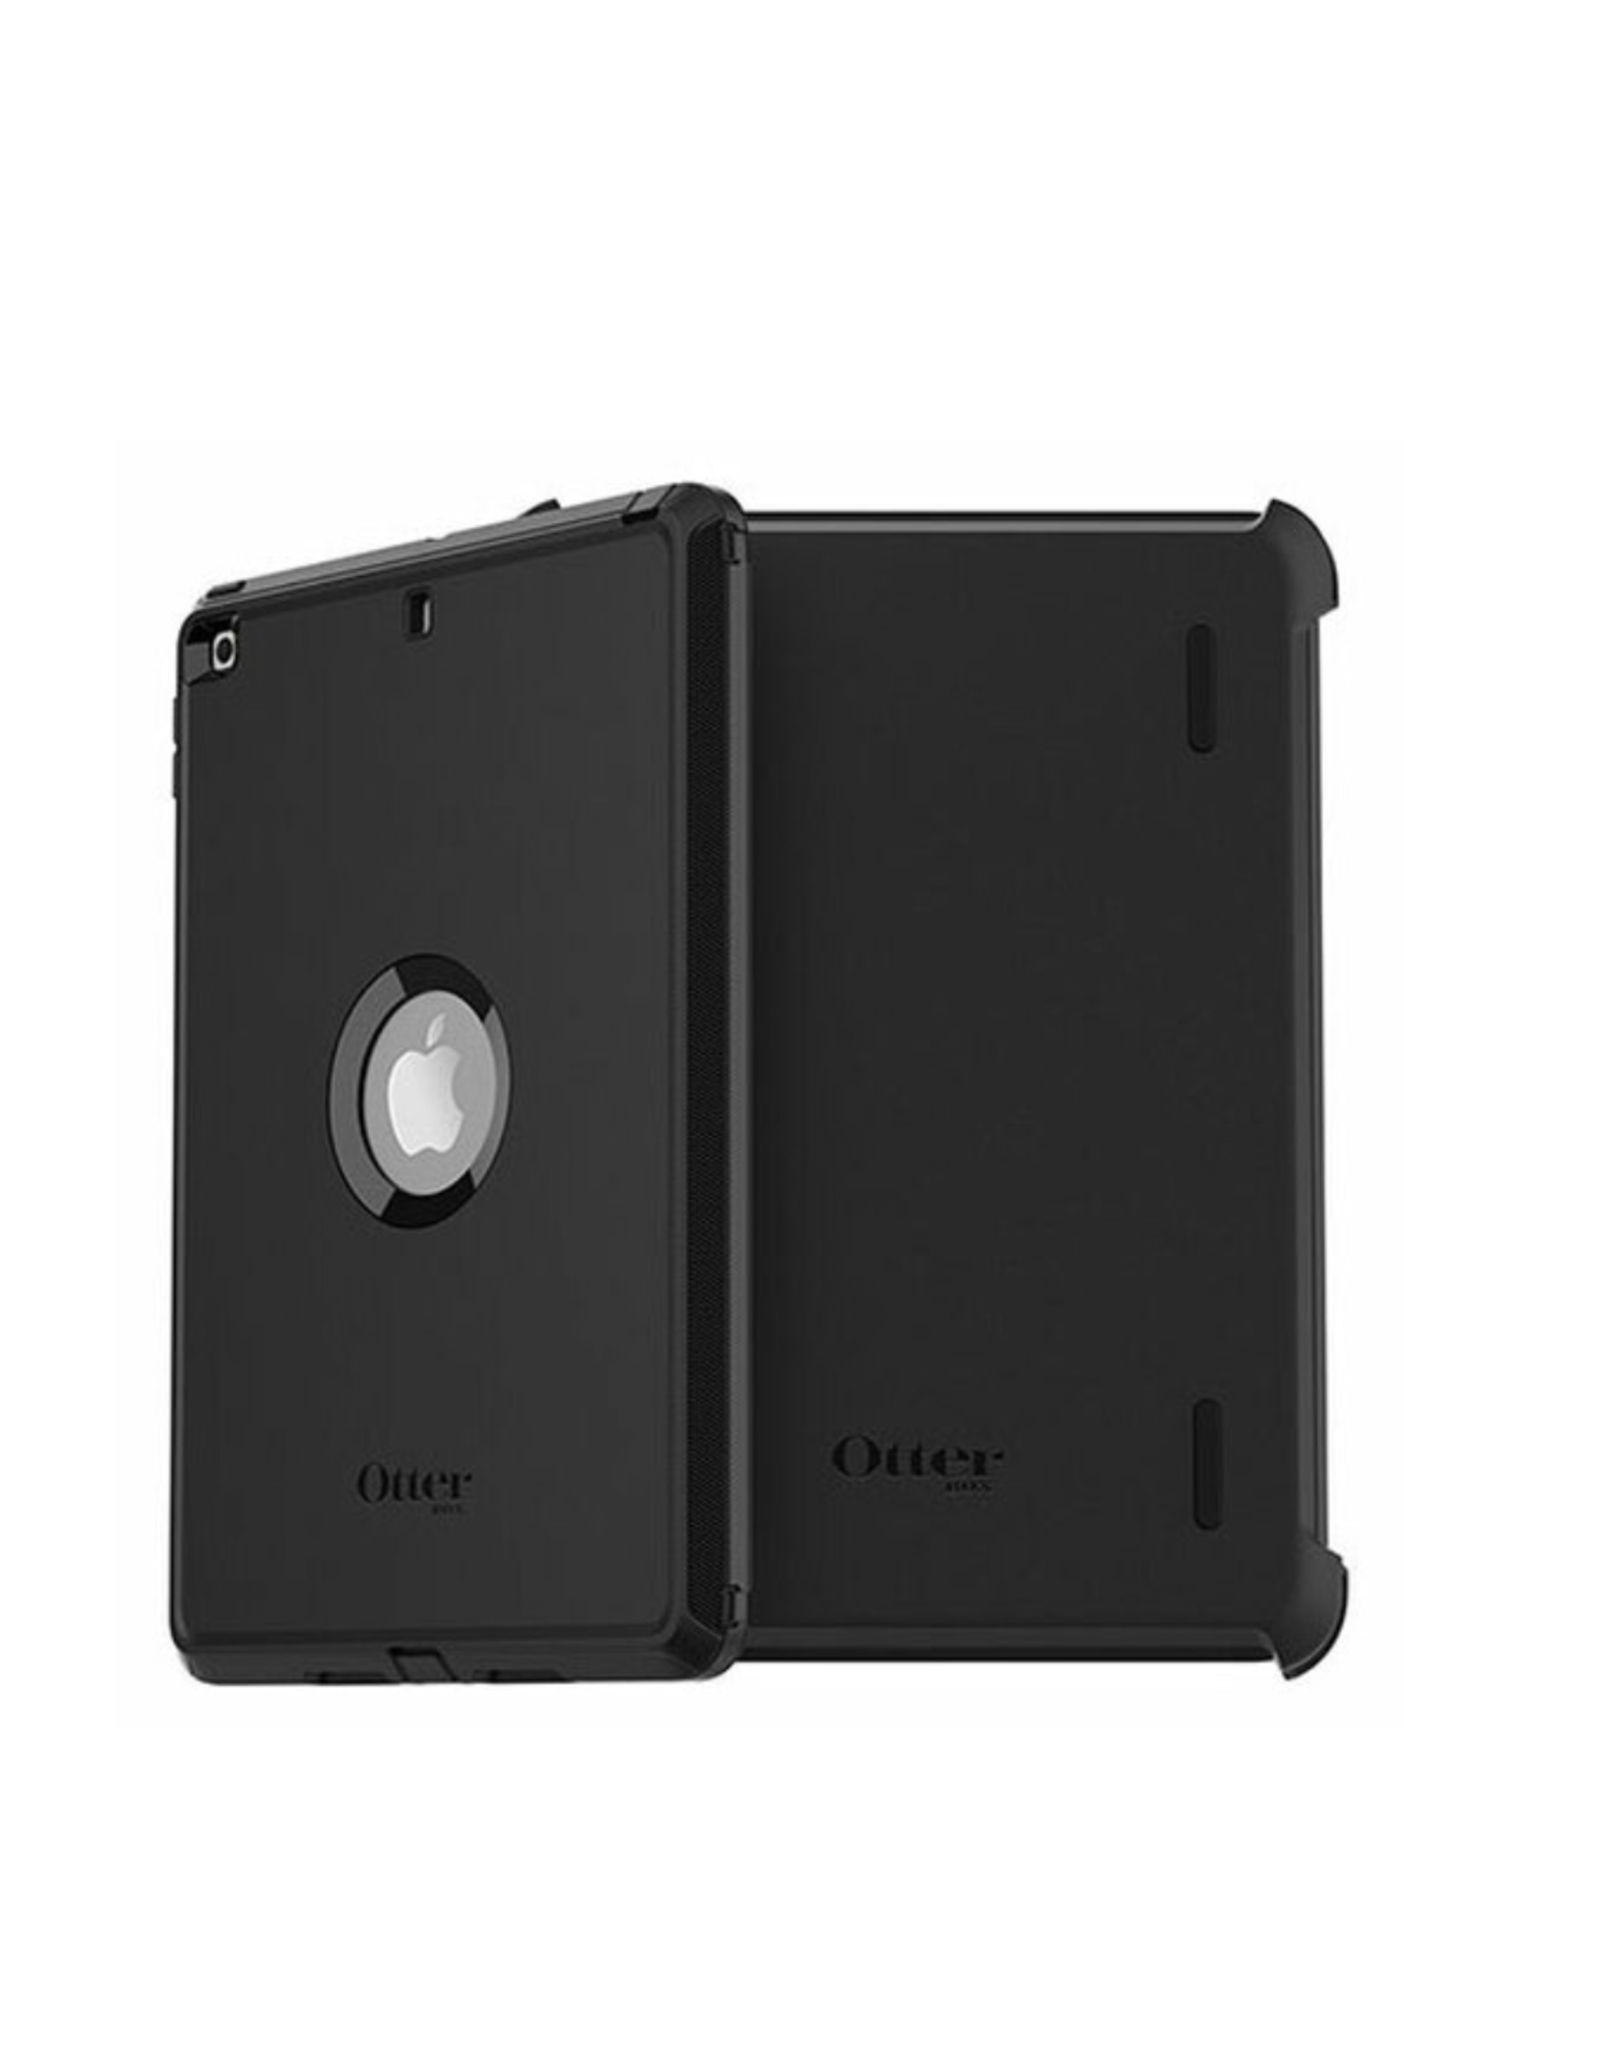 "Otterbox Otterbox Case For 10.2"" iPad (7th/8th Gen)"